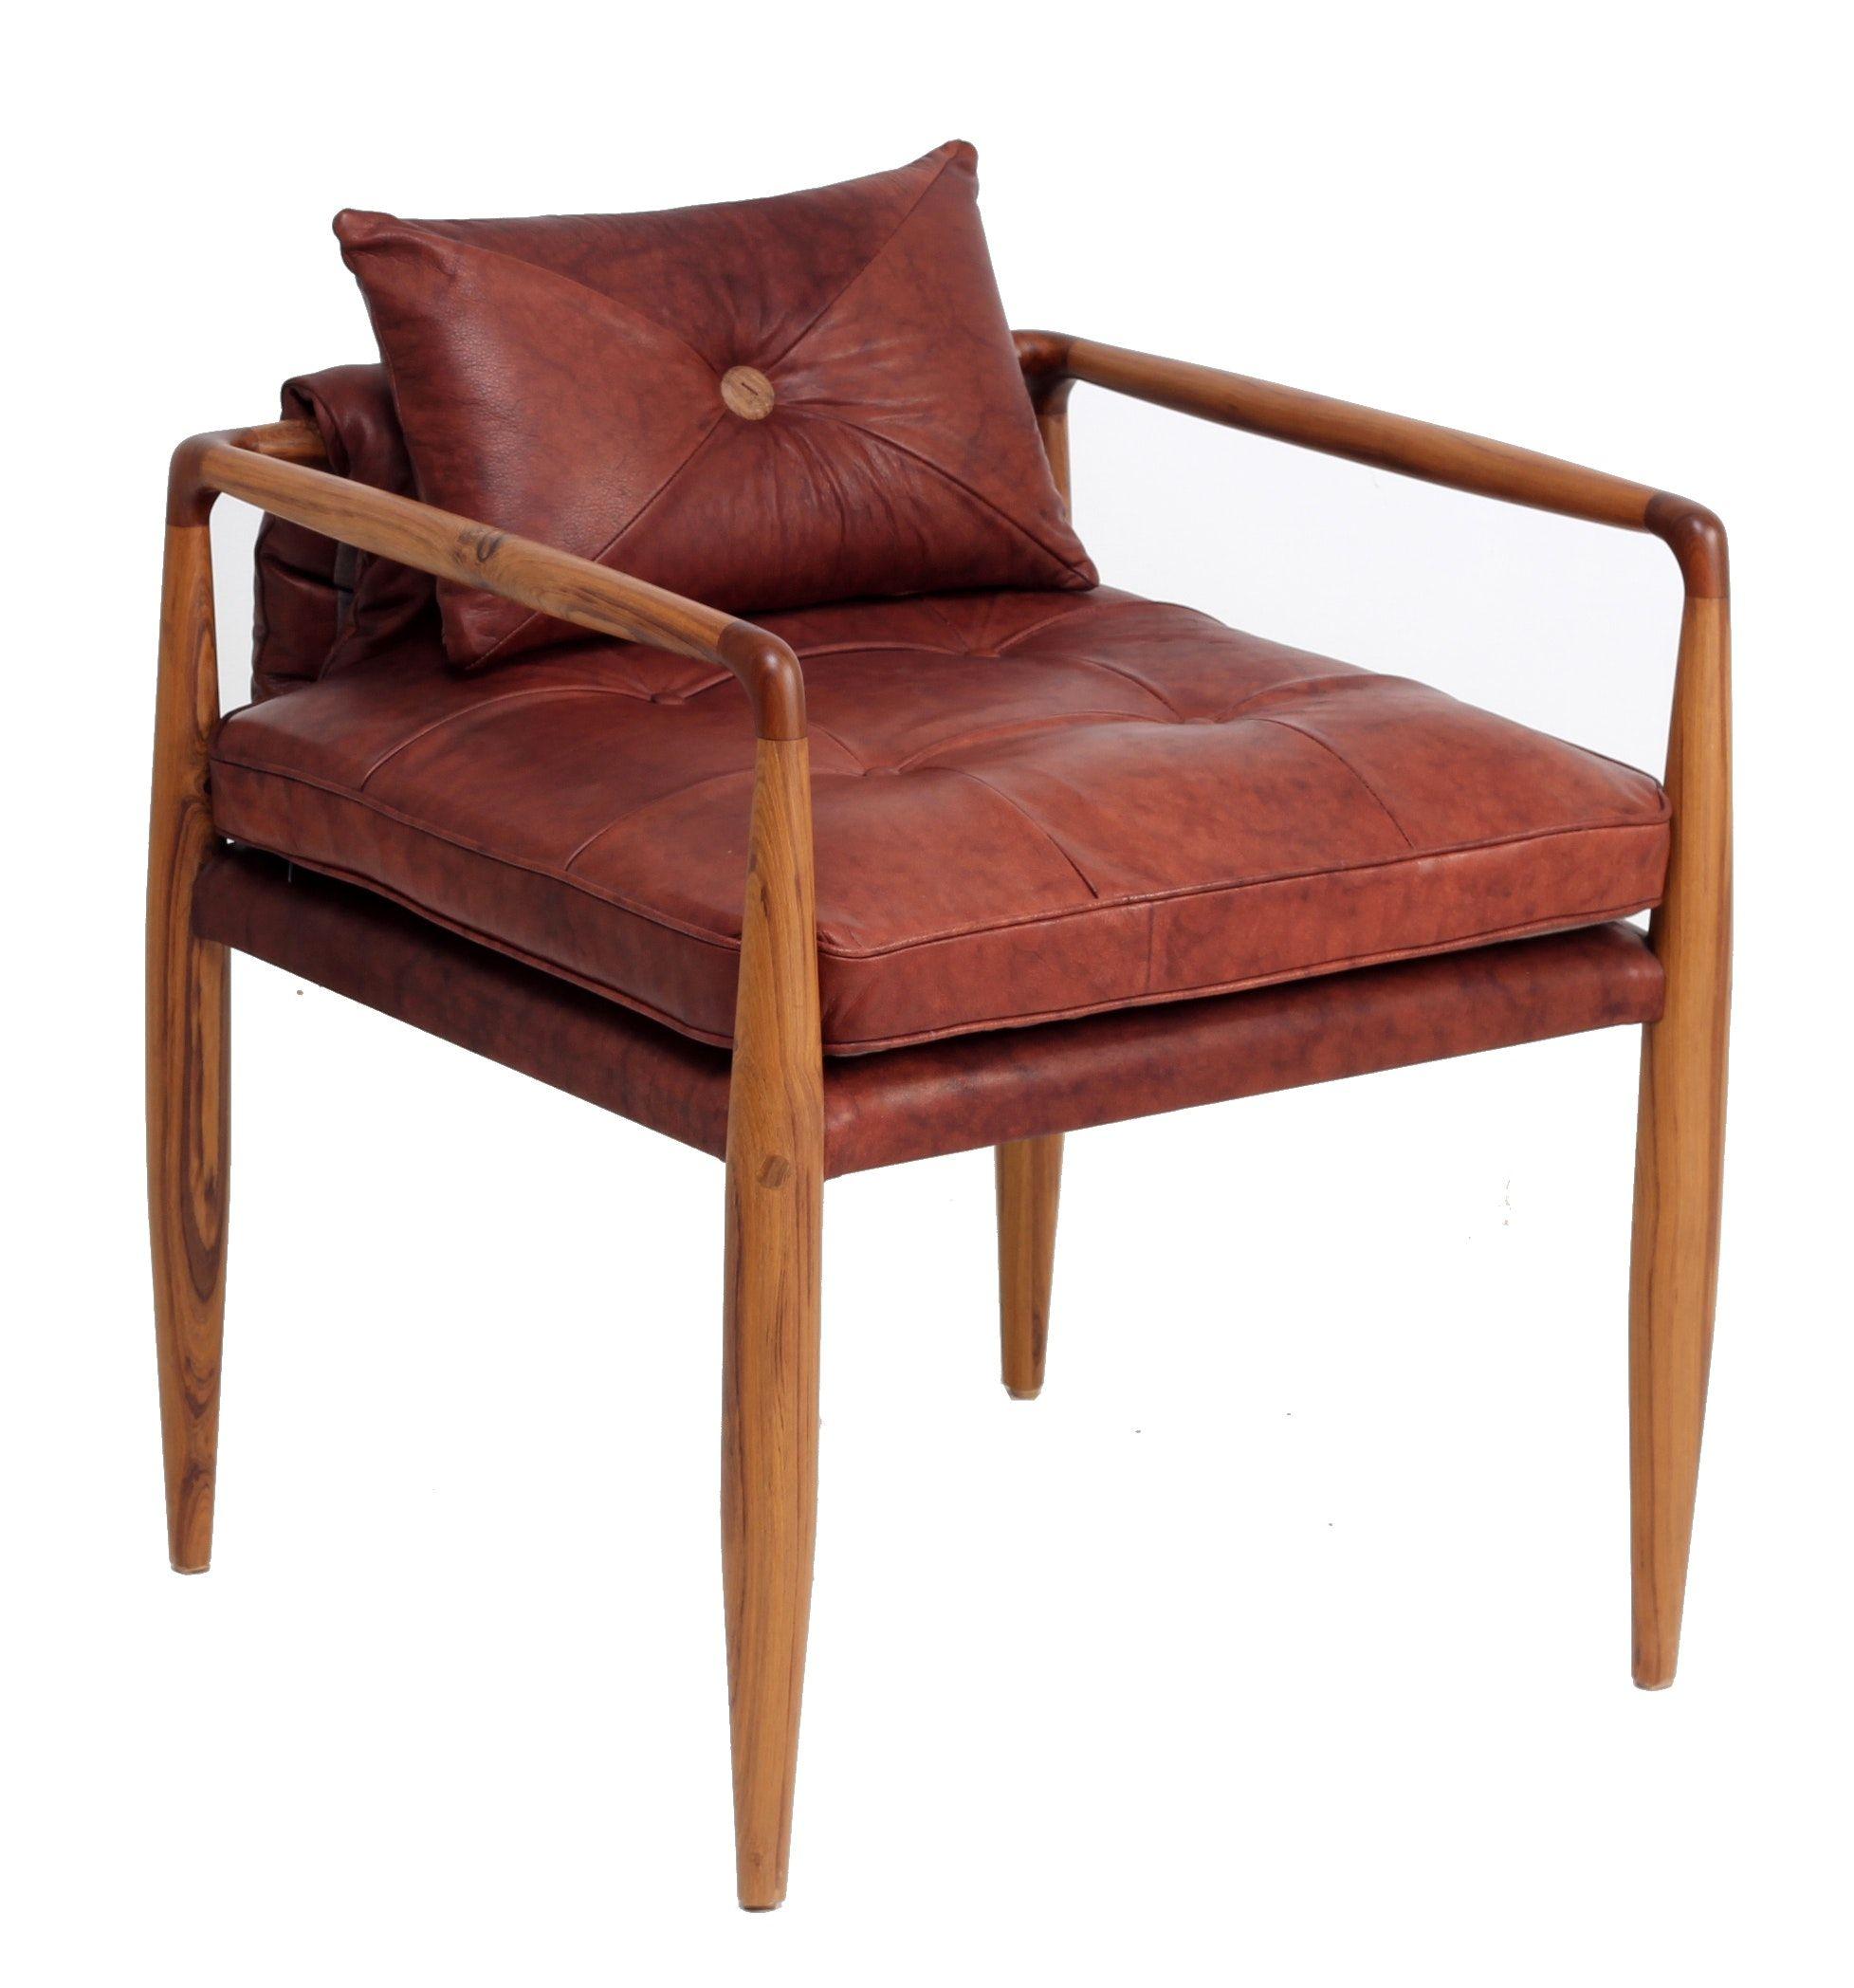 Best Kutu A Stylish Comfortable Chair By Alankaram Chair 400 x 300